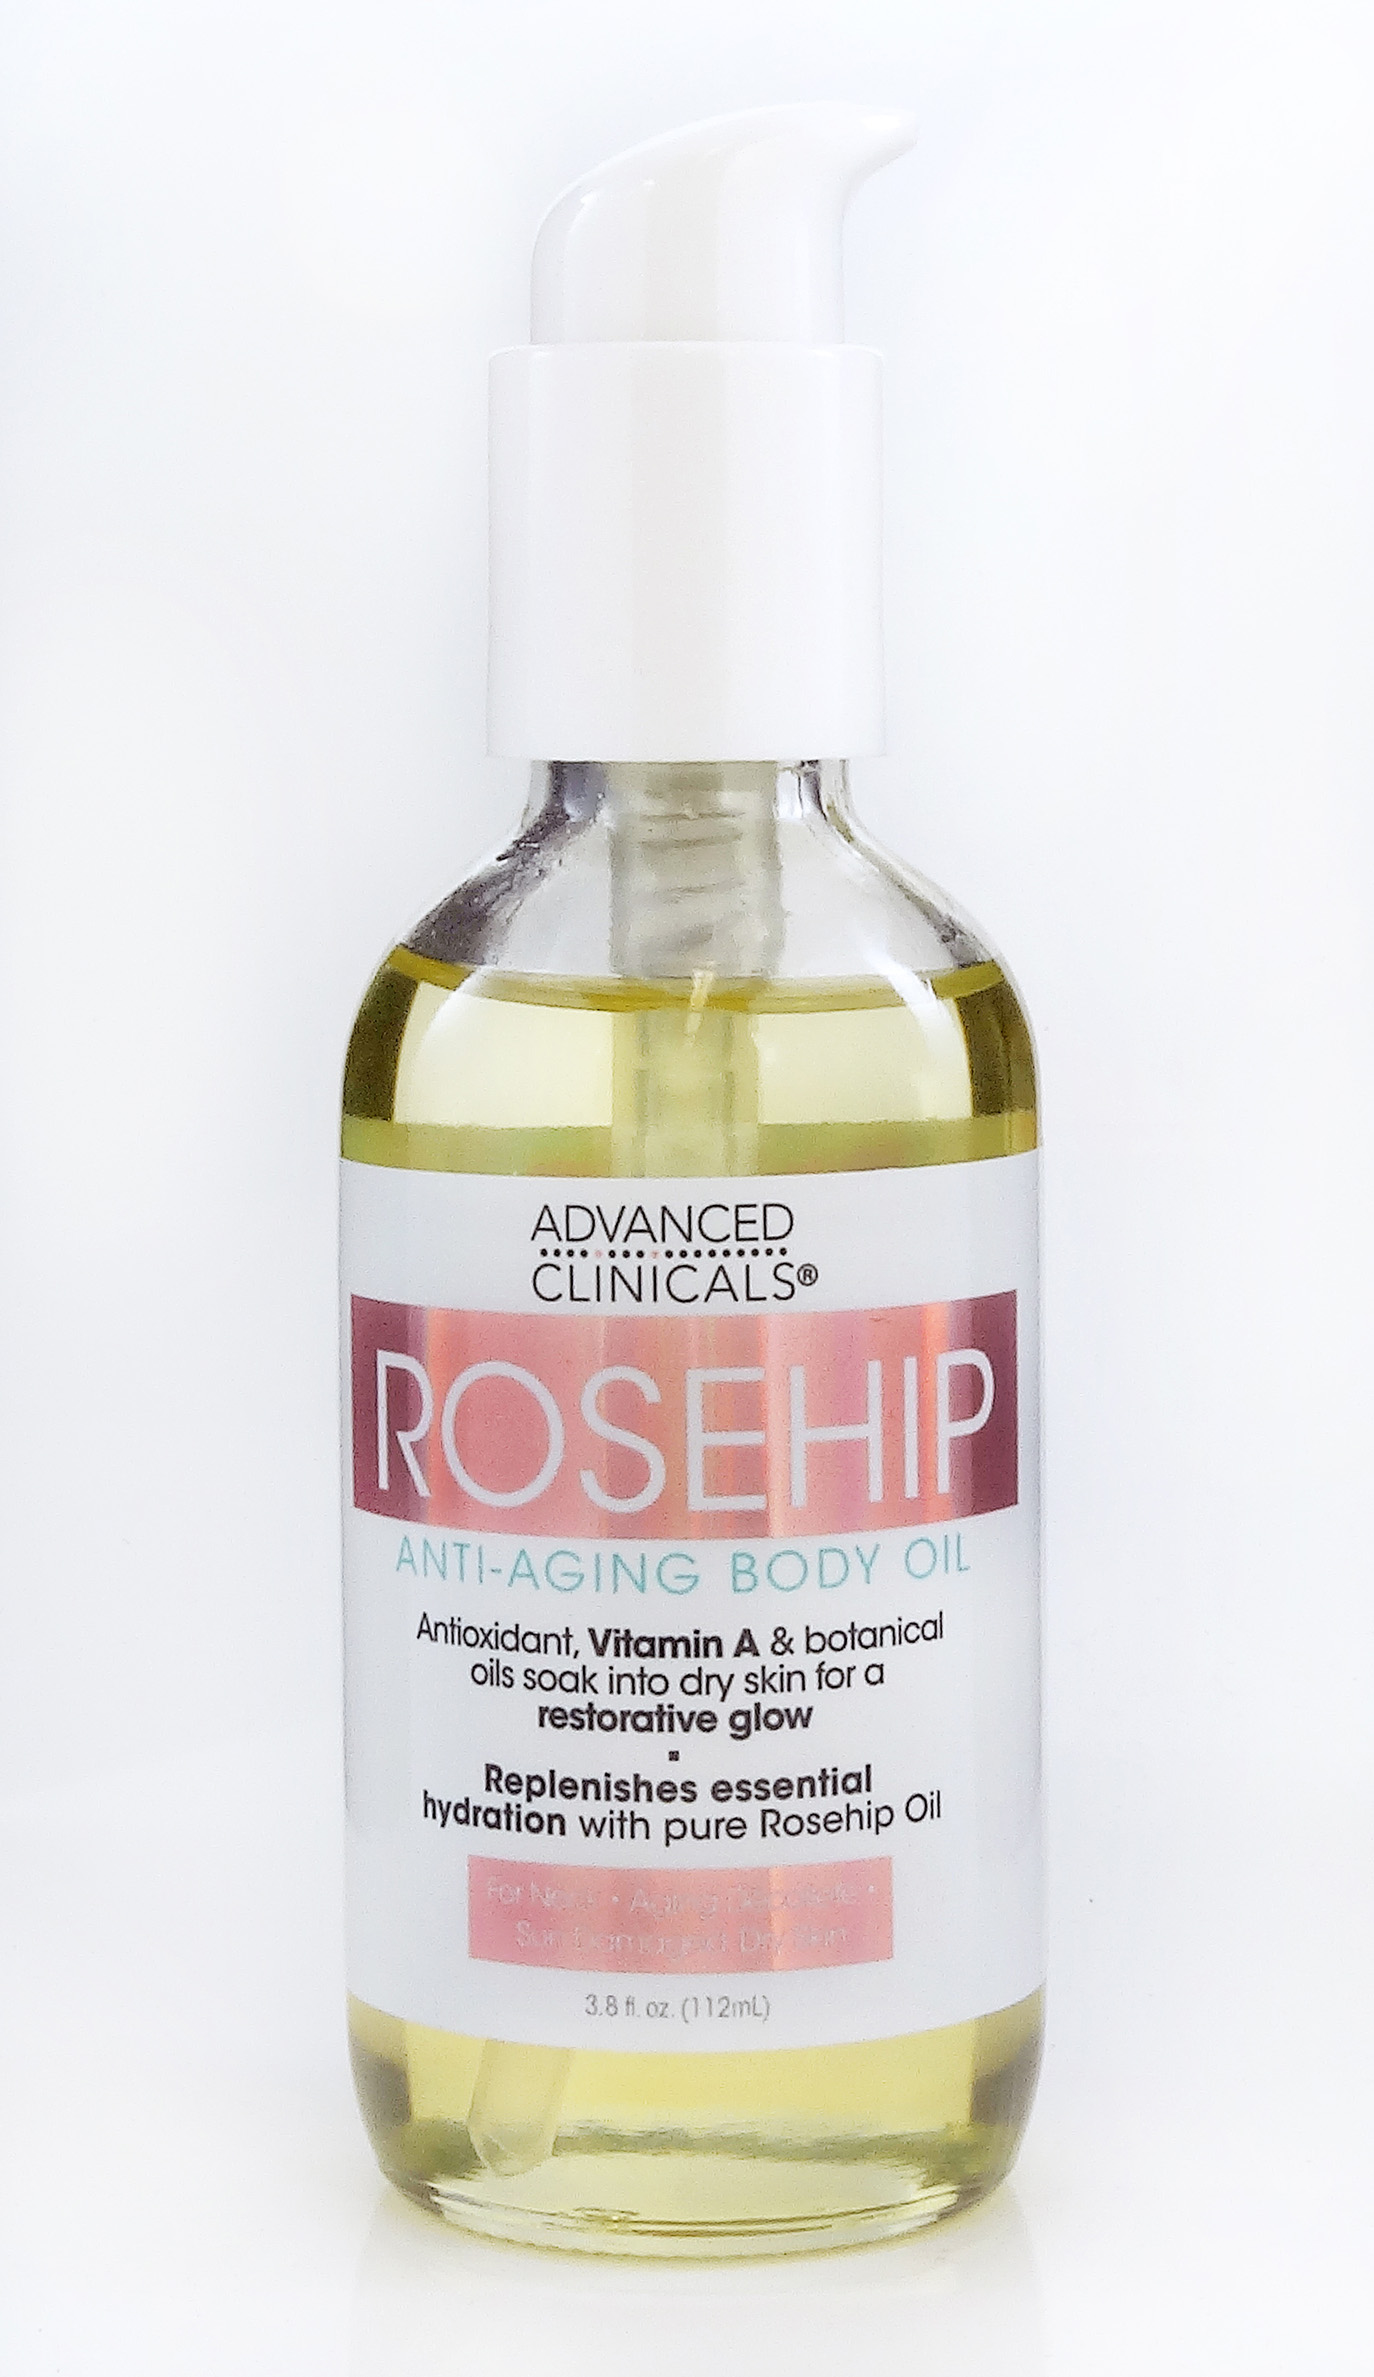 Rosehip Anti-Aging Body Oil 3 8oz — Advanced Clinicals